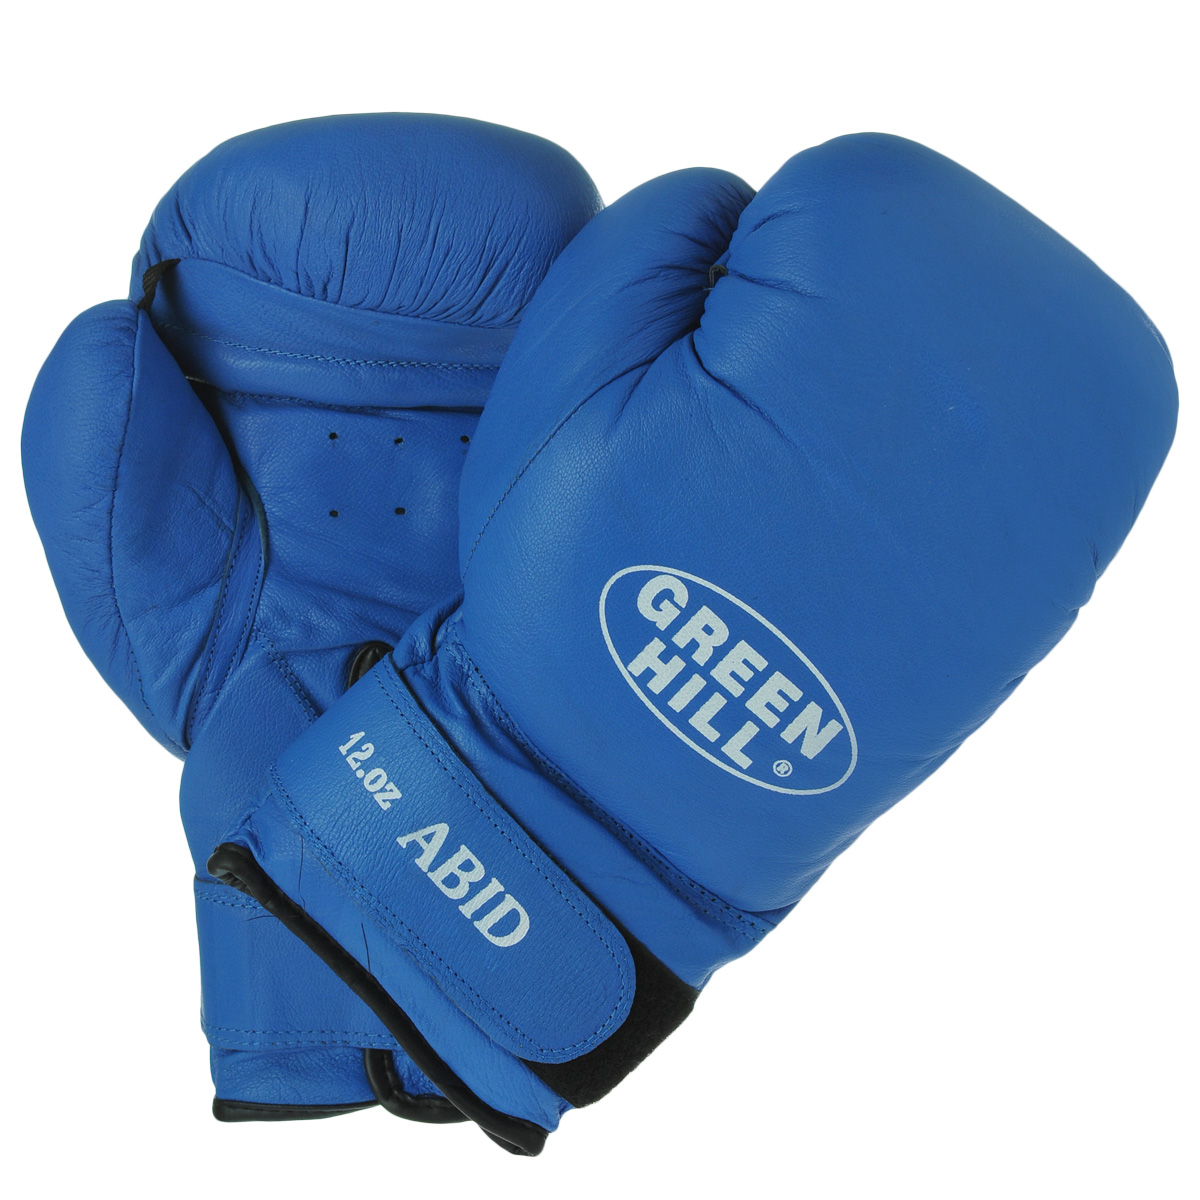 Перчатки боксерские Green Hill Abid, цвет: синий. Вес 12 унций перчатки боксерские green hill abid цвет синий белый вес 16 унций